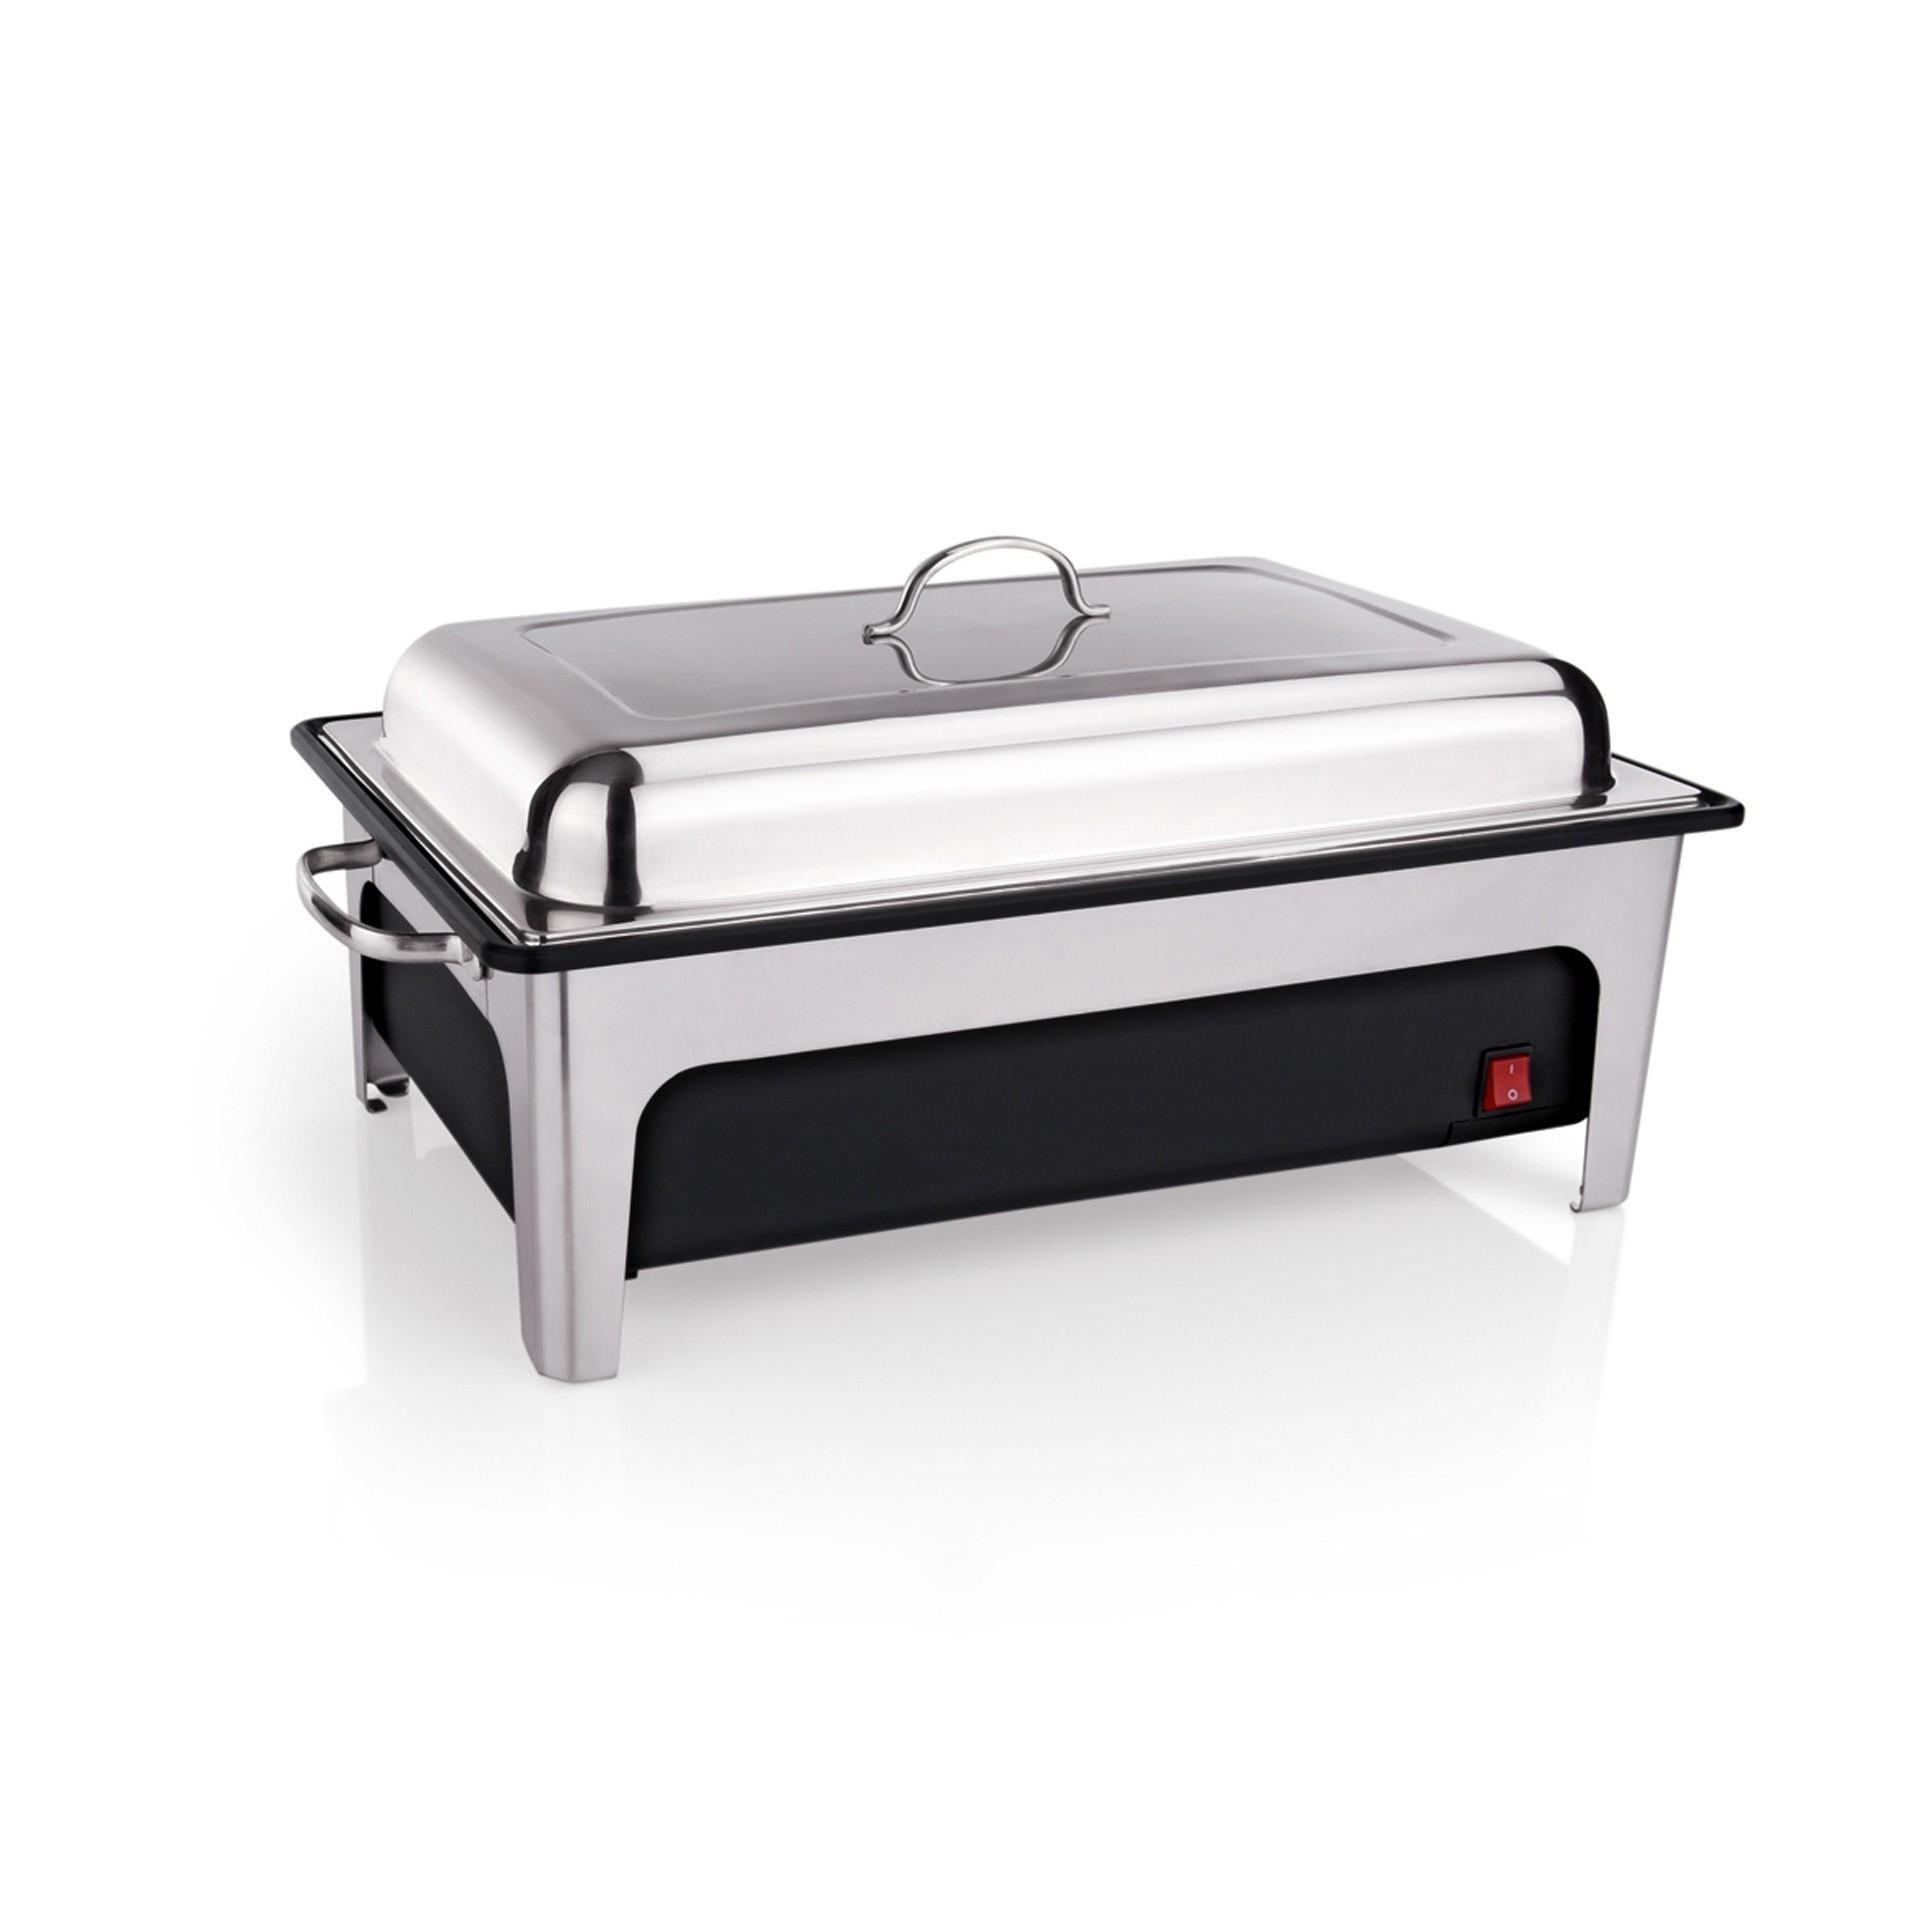 elektro chafing dish mit regelthermostat g nstig kaufen. Black Bedroom Furniture Sets. Home Design Ideas